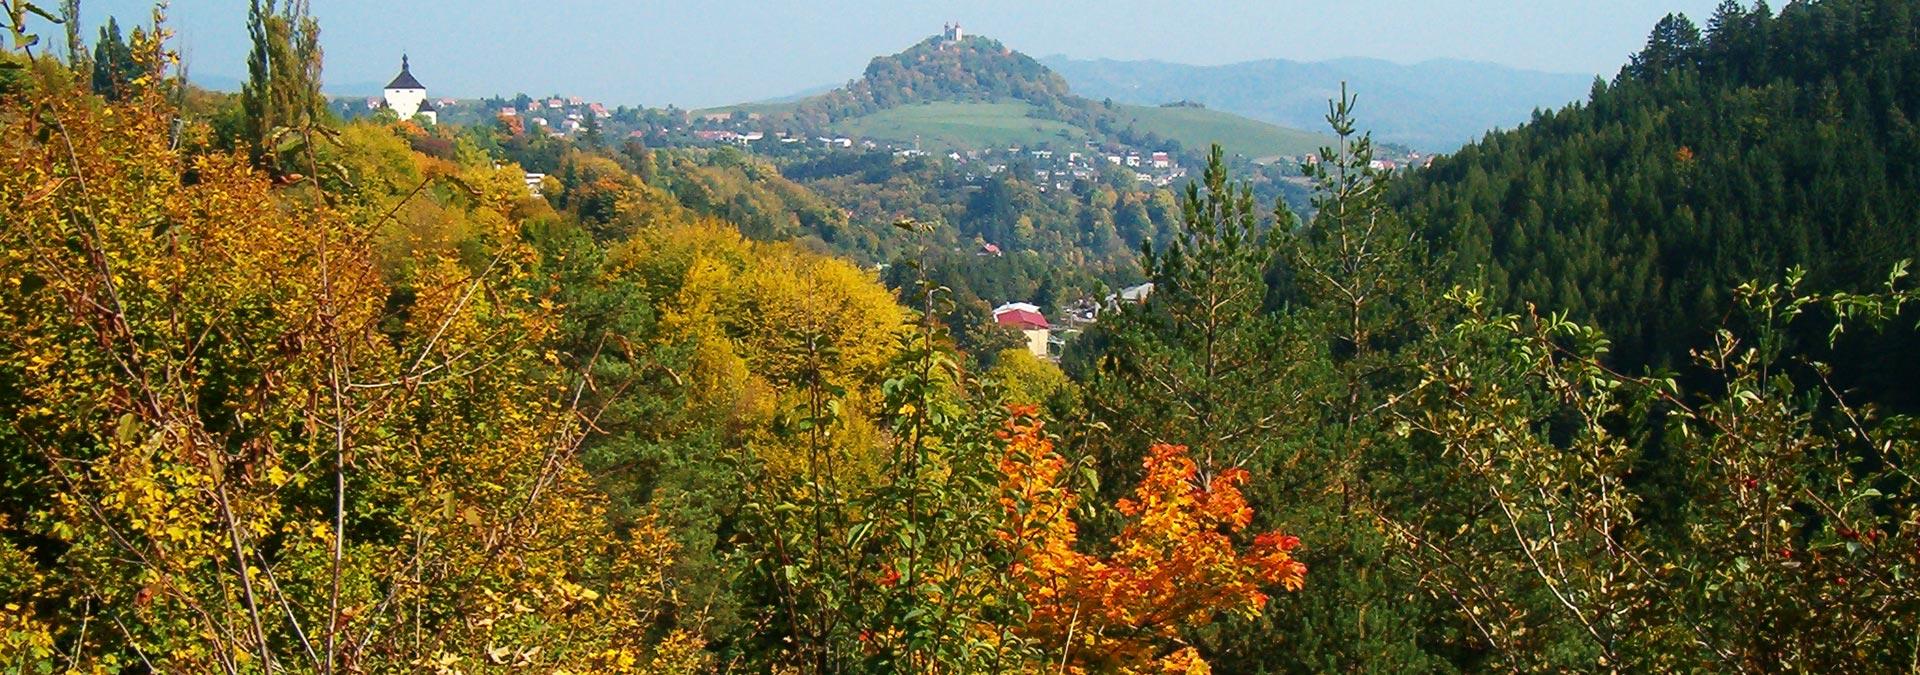 Walking Holidays in Banska Stiavnica UNESCO Heritage, Slovakia Travel, Location